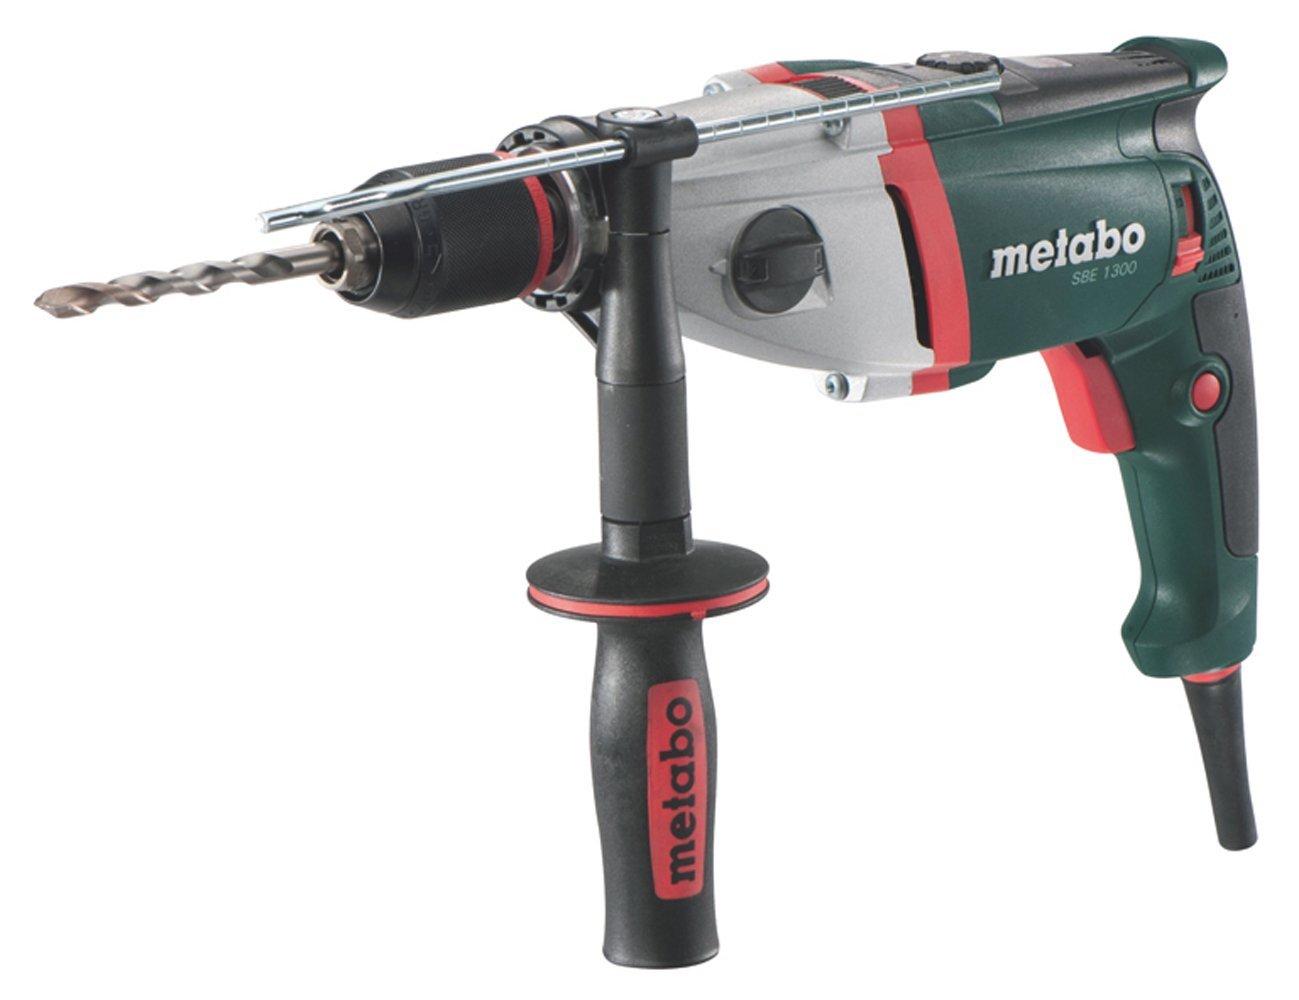 Metabo 600843500 SBE 1300